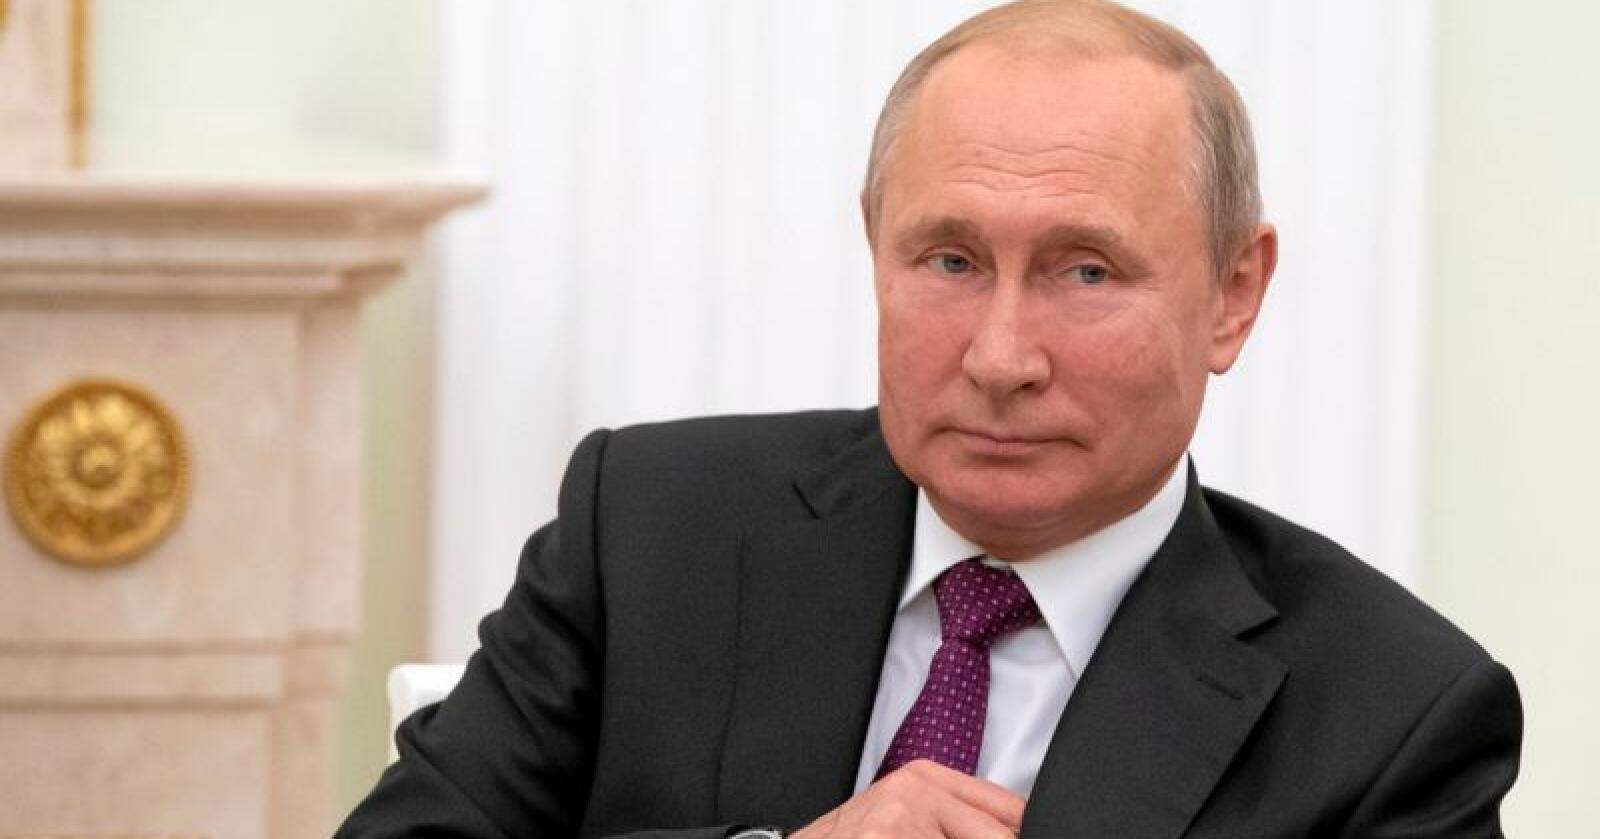 Russlands president Vladimir Putin. Foto: Alexander Zemlianichenko, AP / NTB scanpix